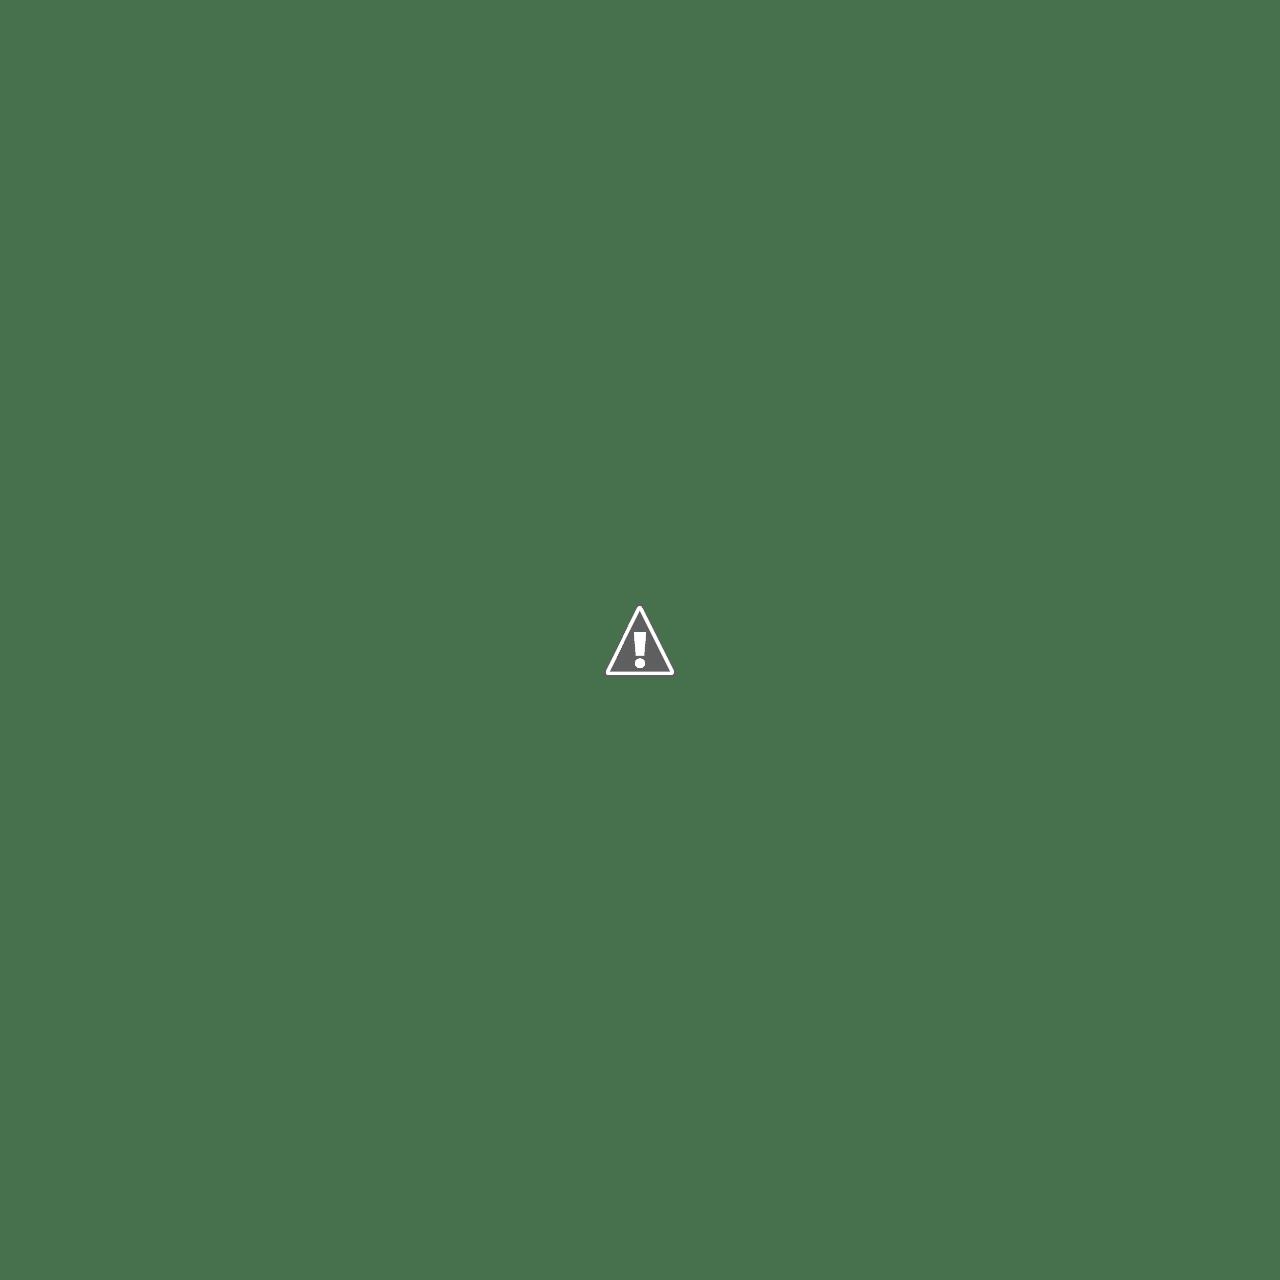 GLOBAL OLYMPIADS ACADEMY - Educational Organization